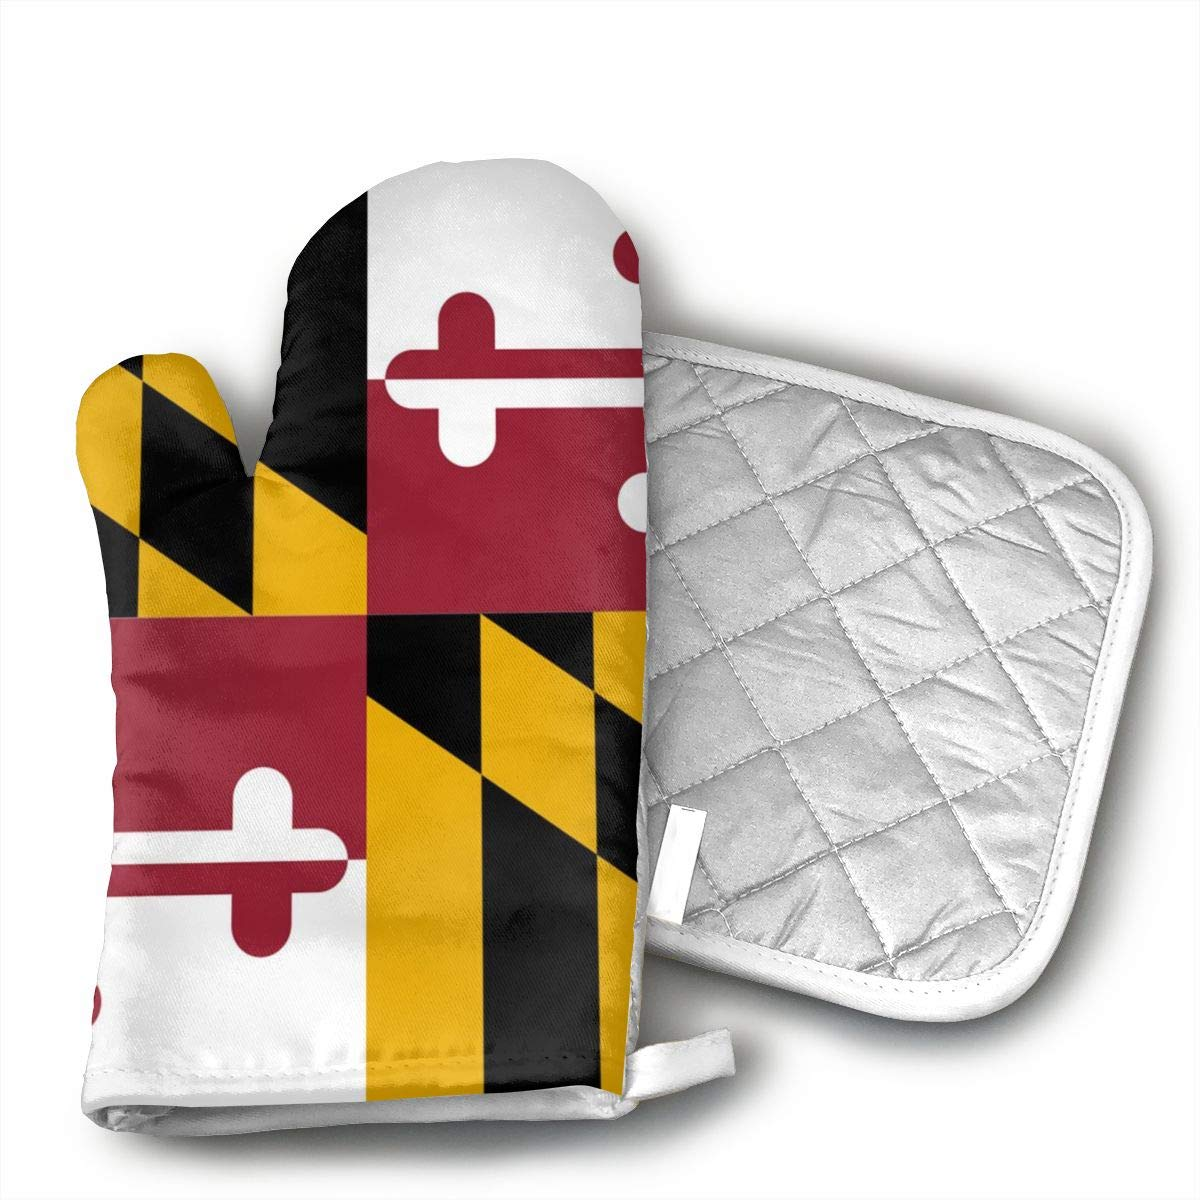 SADLK Maryland Flags Premium Terylene/Oven Mitts and Pot Mat,Pot Mat/Hot Pads, Heat Resistant Gloves Kitchen